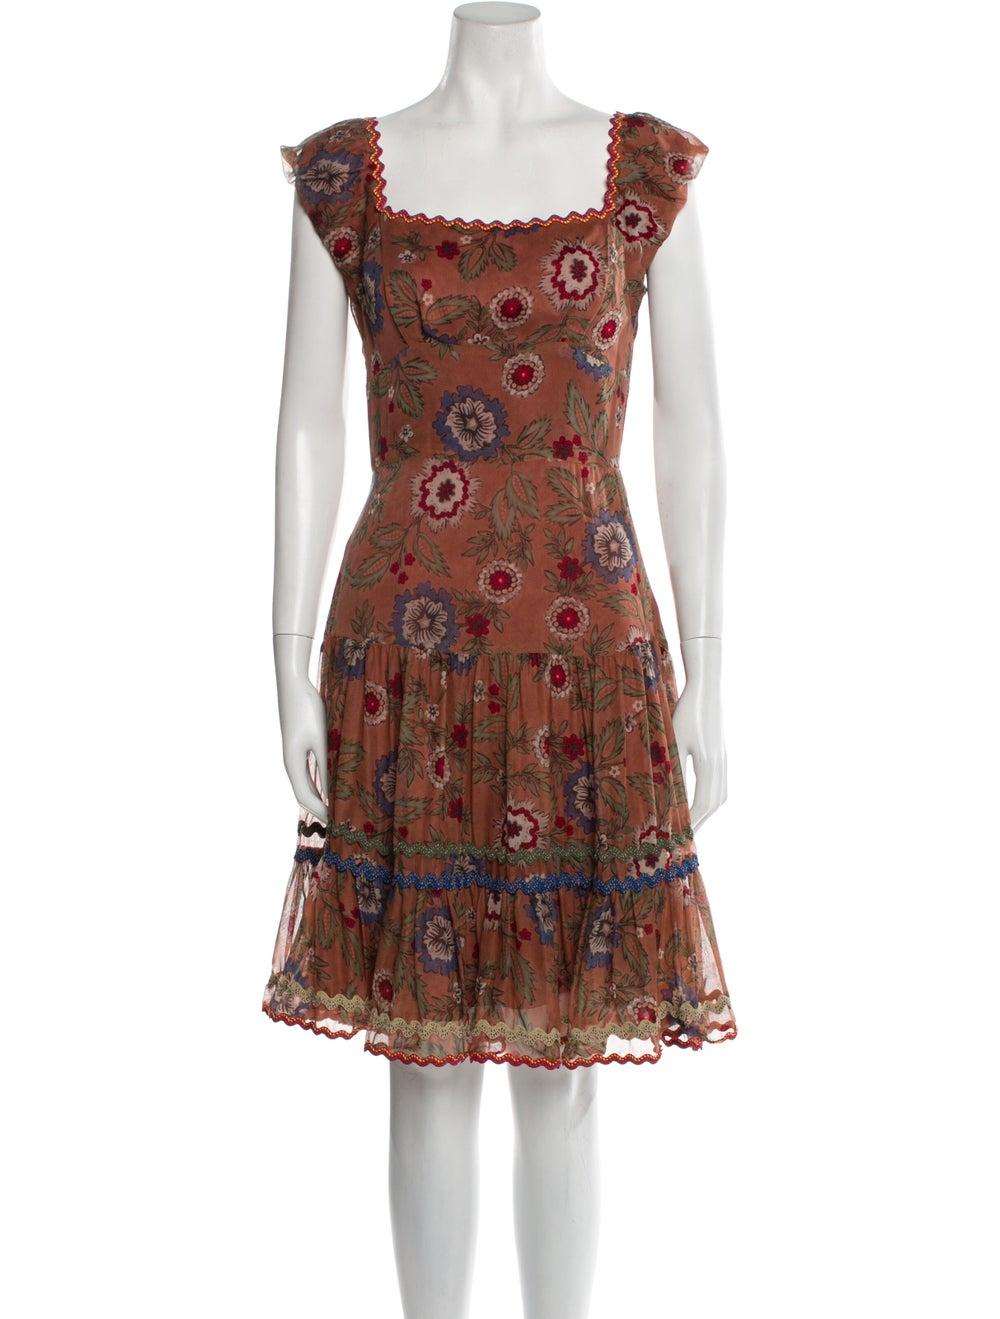 Anna Sui Silk Knee-Length Dress Pink - image 1